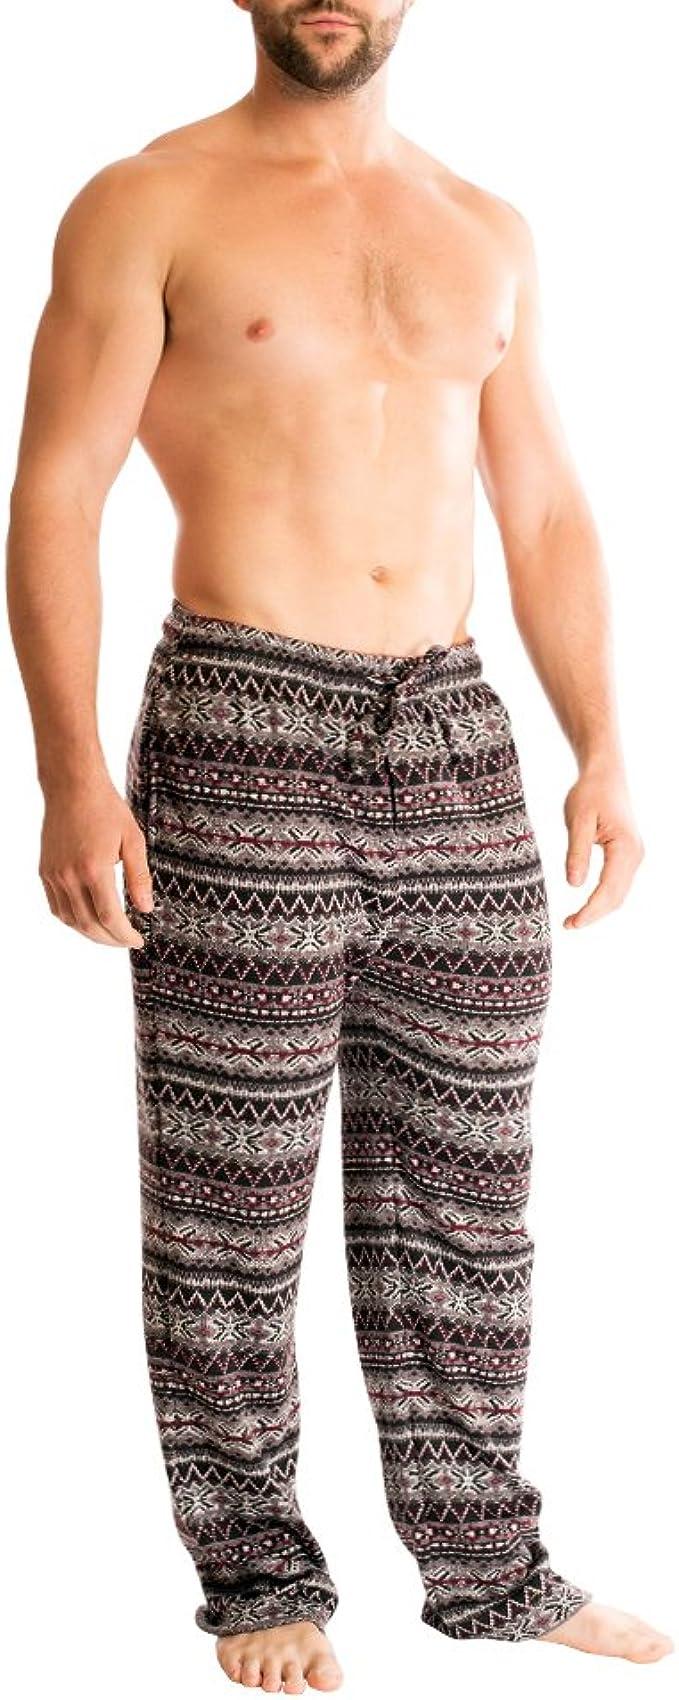 Bottoms Out Mens Designer Comfortable Unique Sweater Fleece Pajama Sleep Lounge PJ Pants for Men